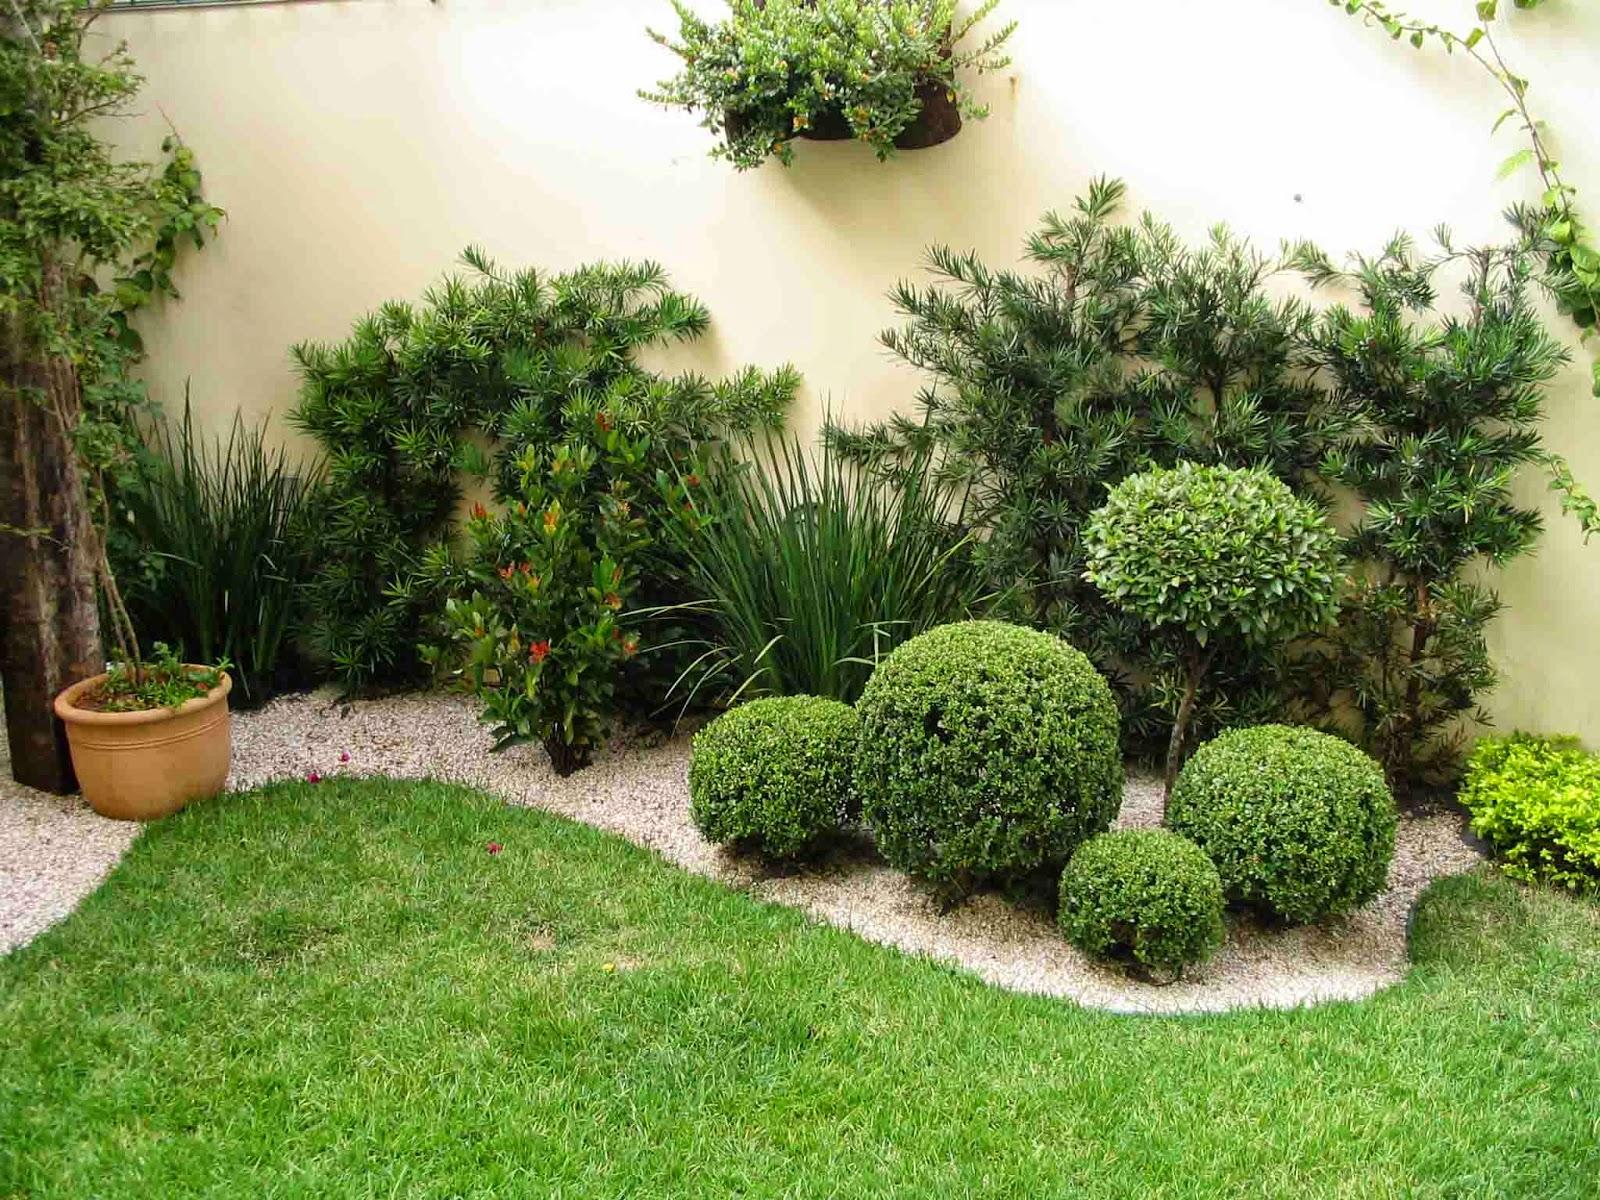 fotos de um jardim lindo : fotos de um jardim lindo:Jardins Residenciais – Fotos e modelos – Toda Atual